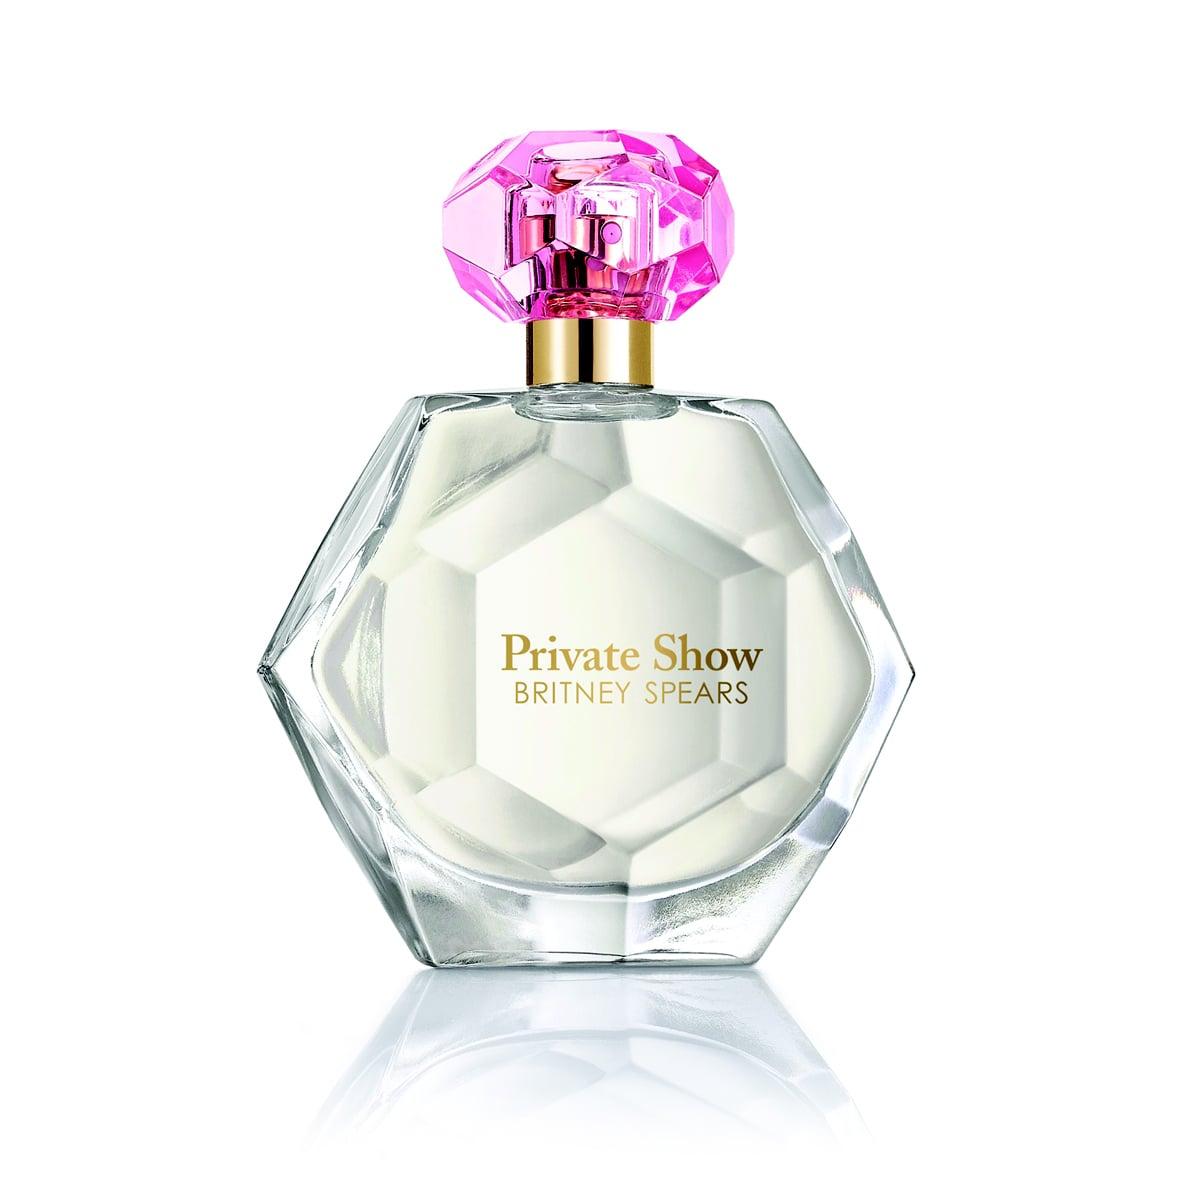 Britney-Spears-Private-Show-Perfume.jpg